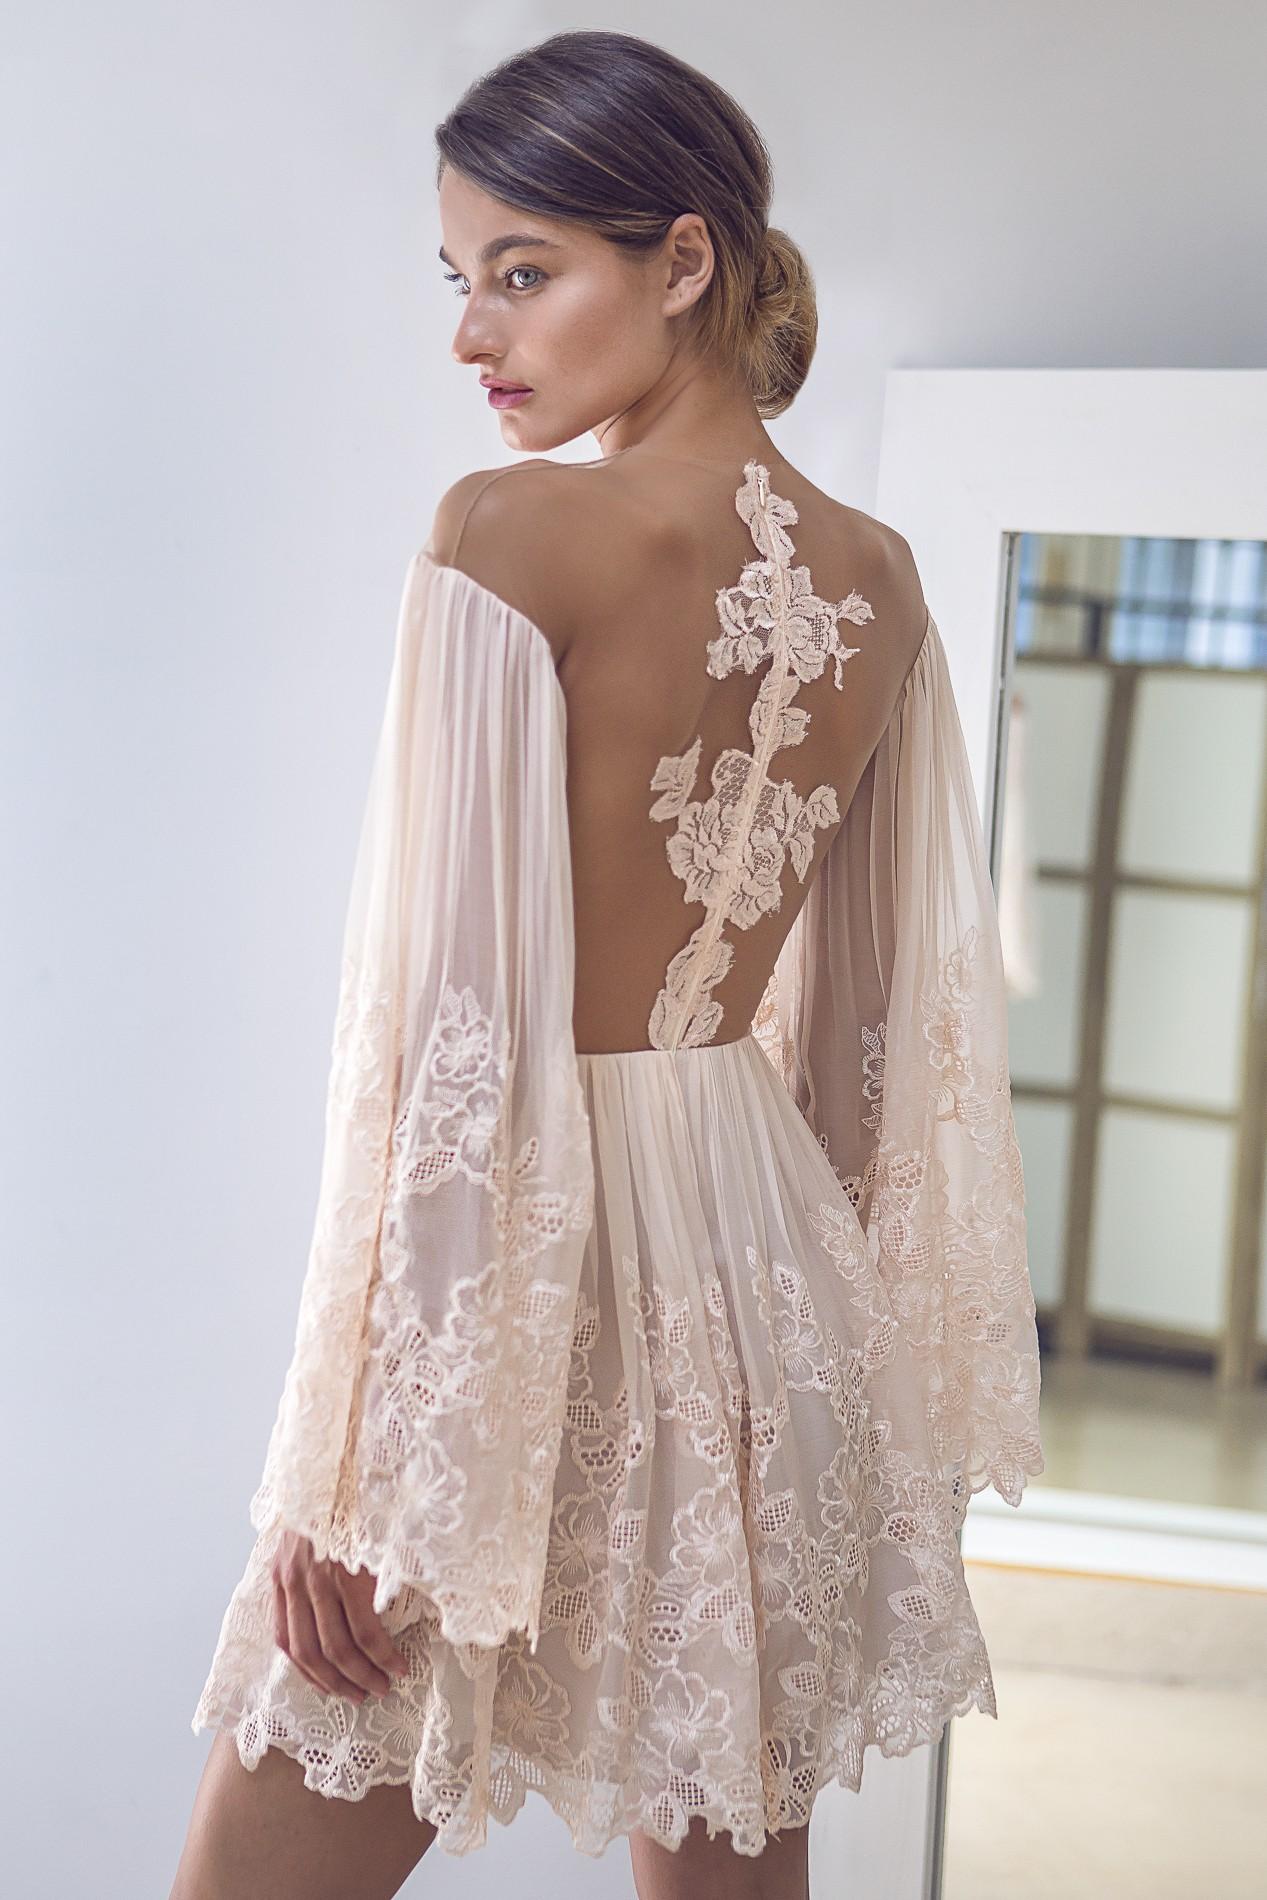 SHORT LACE BOHO DRESS - Rhea Costa-Shop